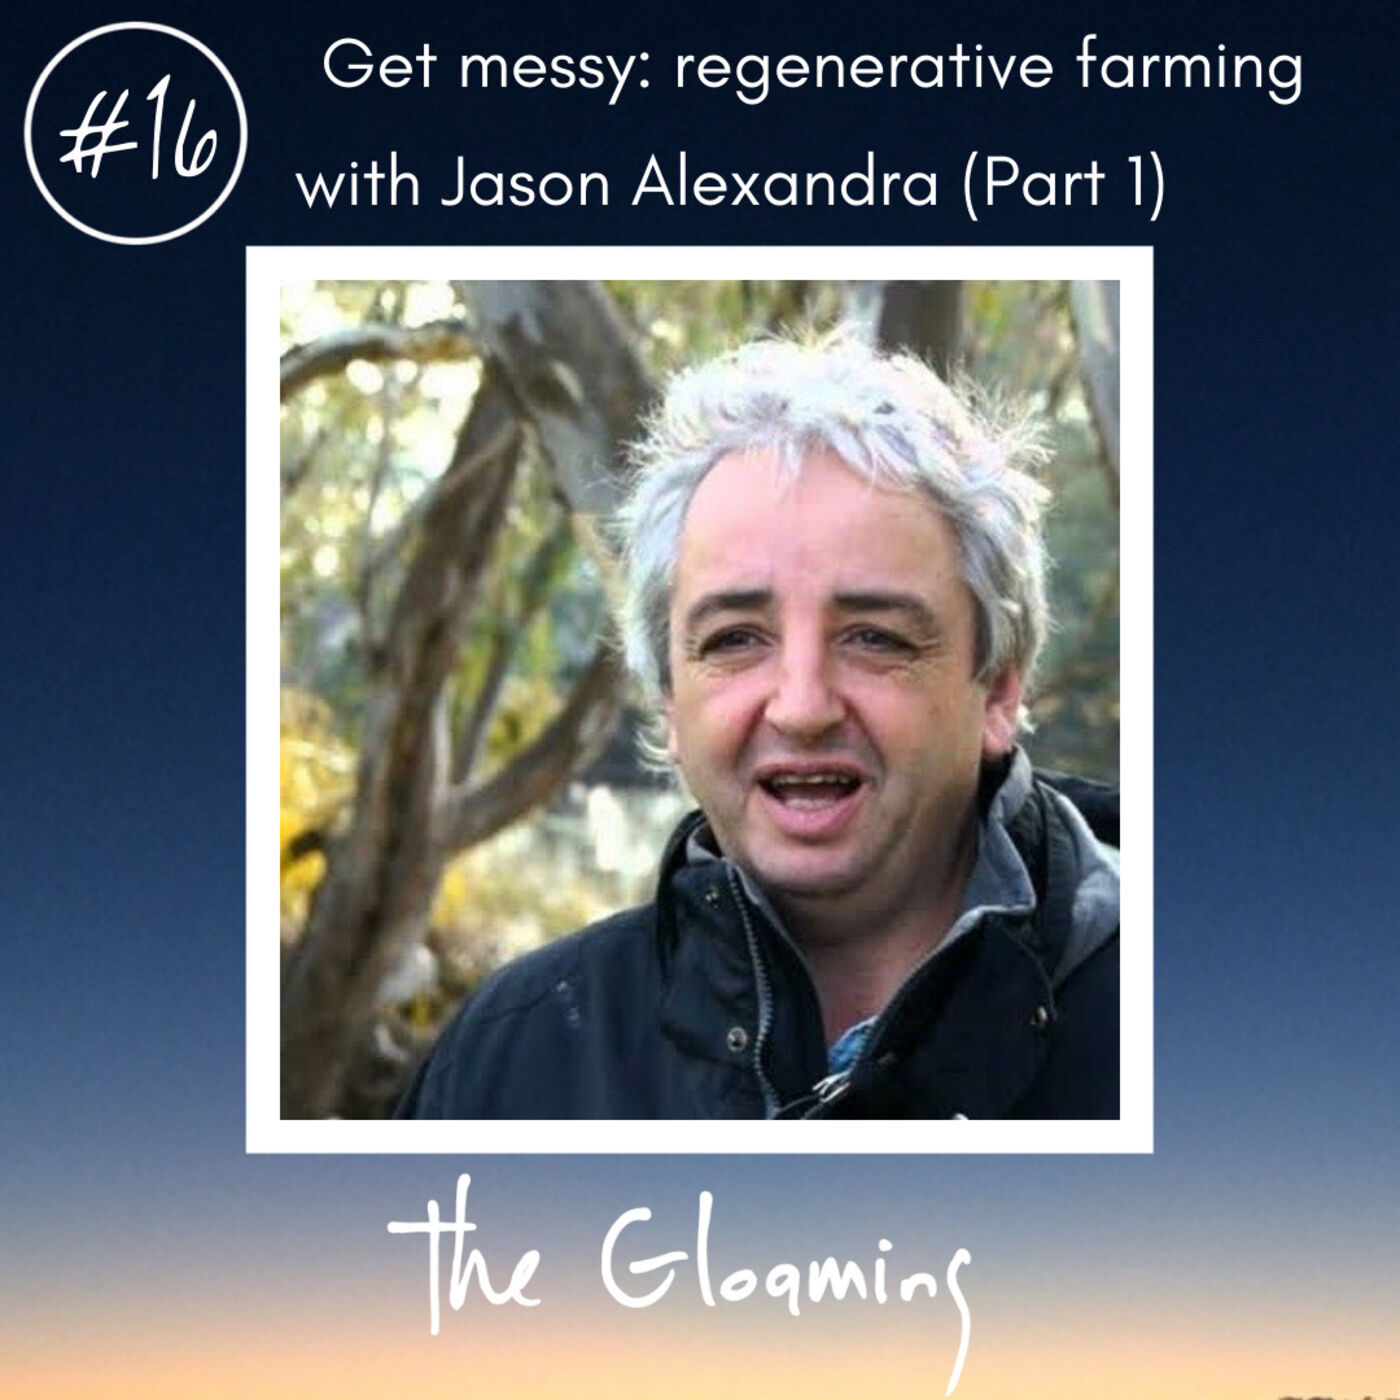 TG16: Get messy: regenerative farming (with Jason Alexandra - Part 1)